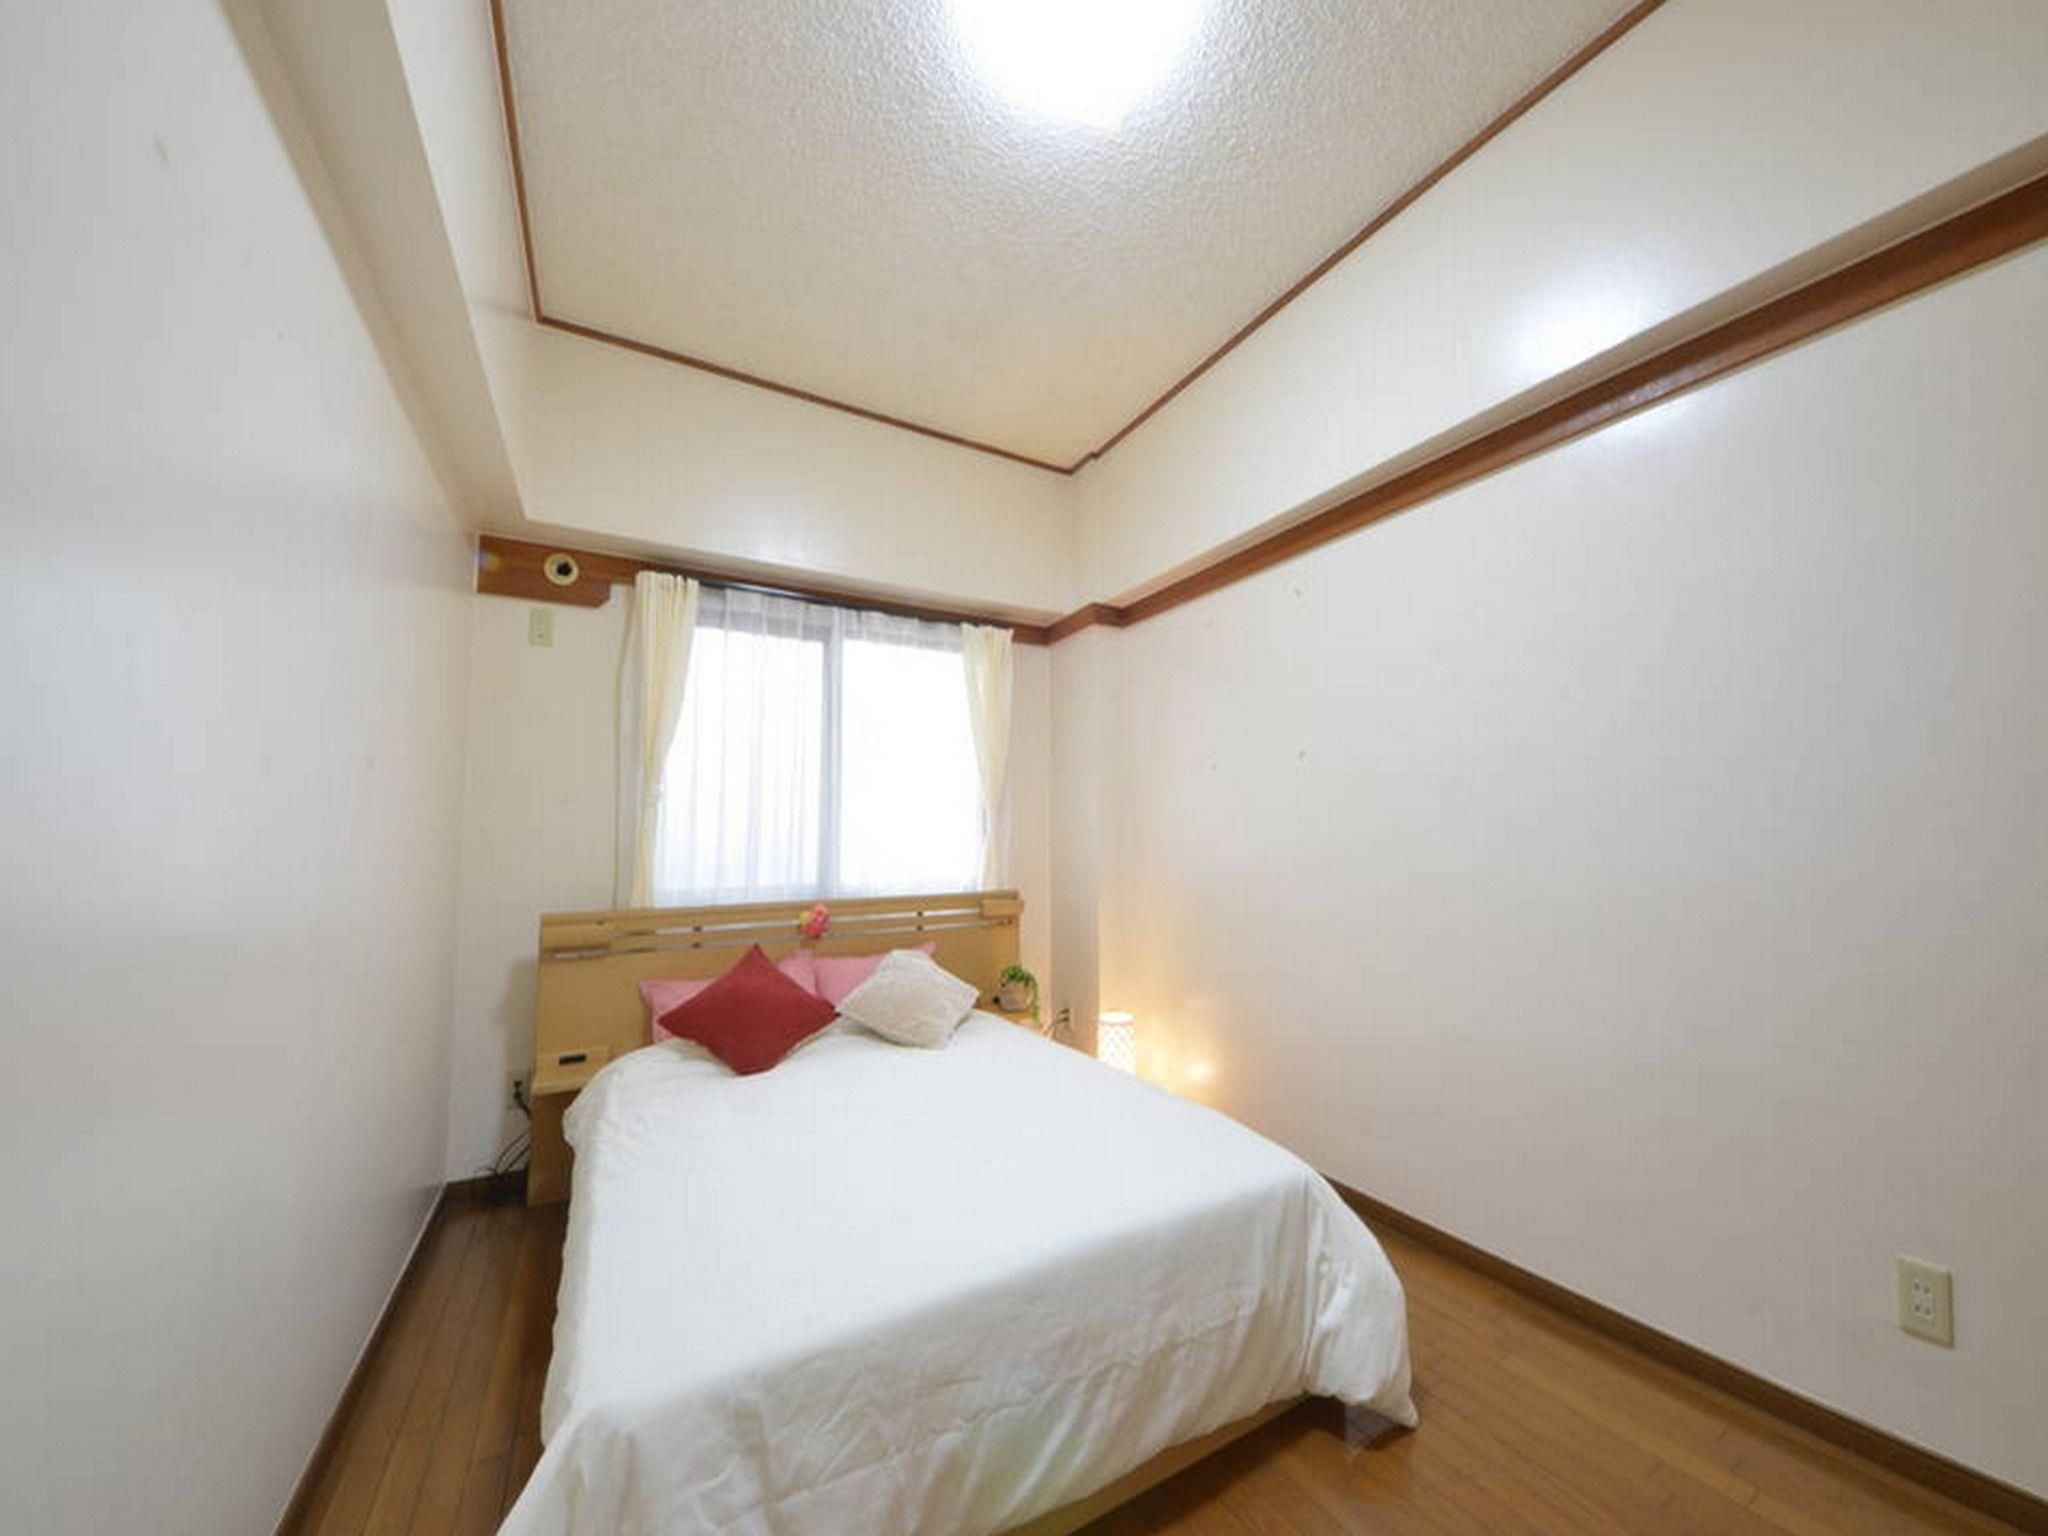 SG 3 Bedroom Apartment near NAHA Airport&Kokusai Street PS303 Okinawa, Japan